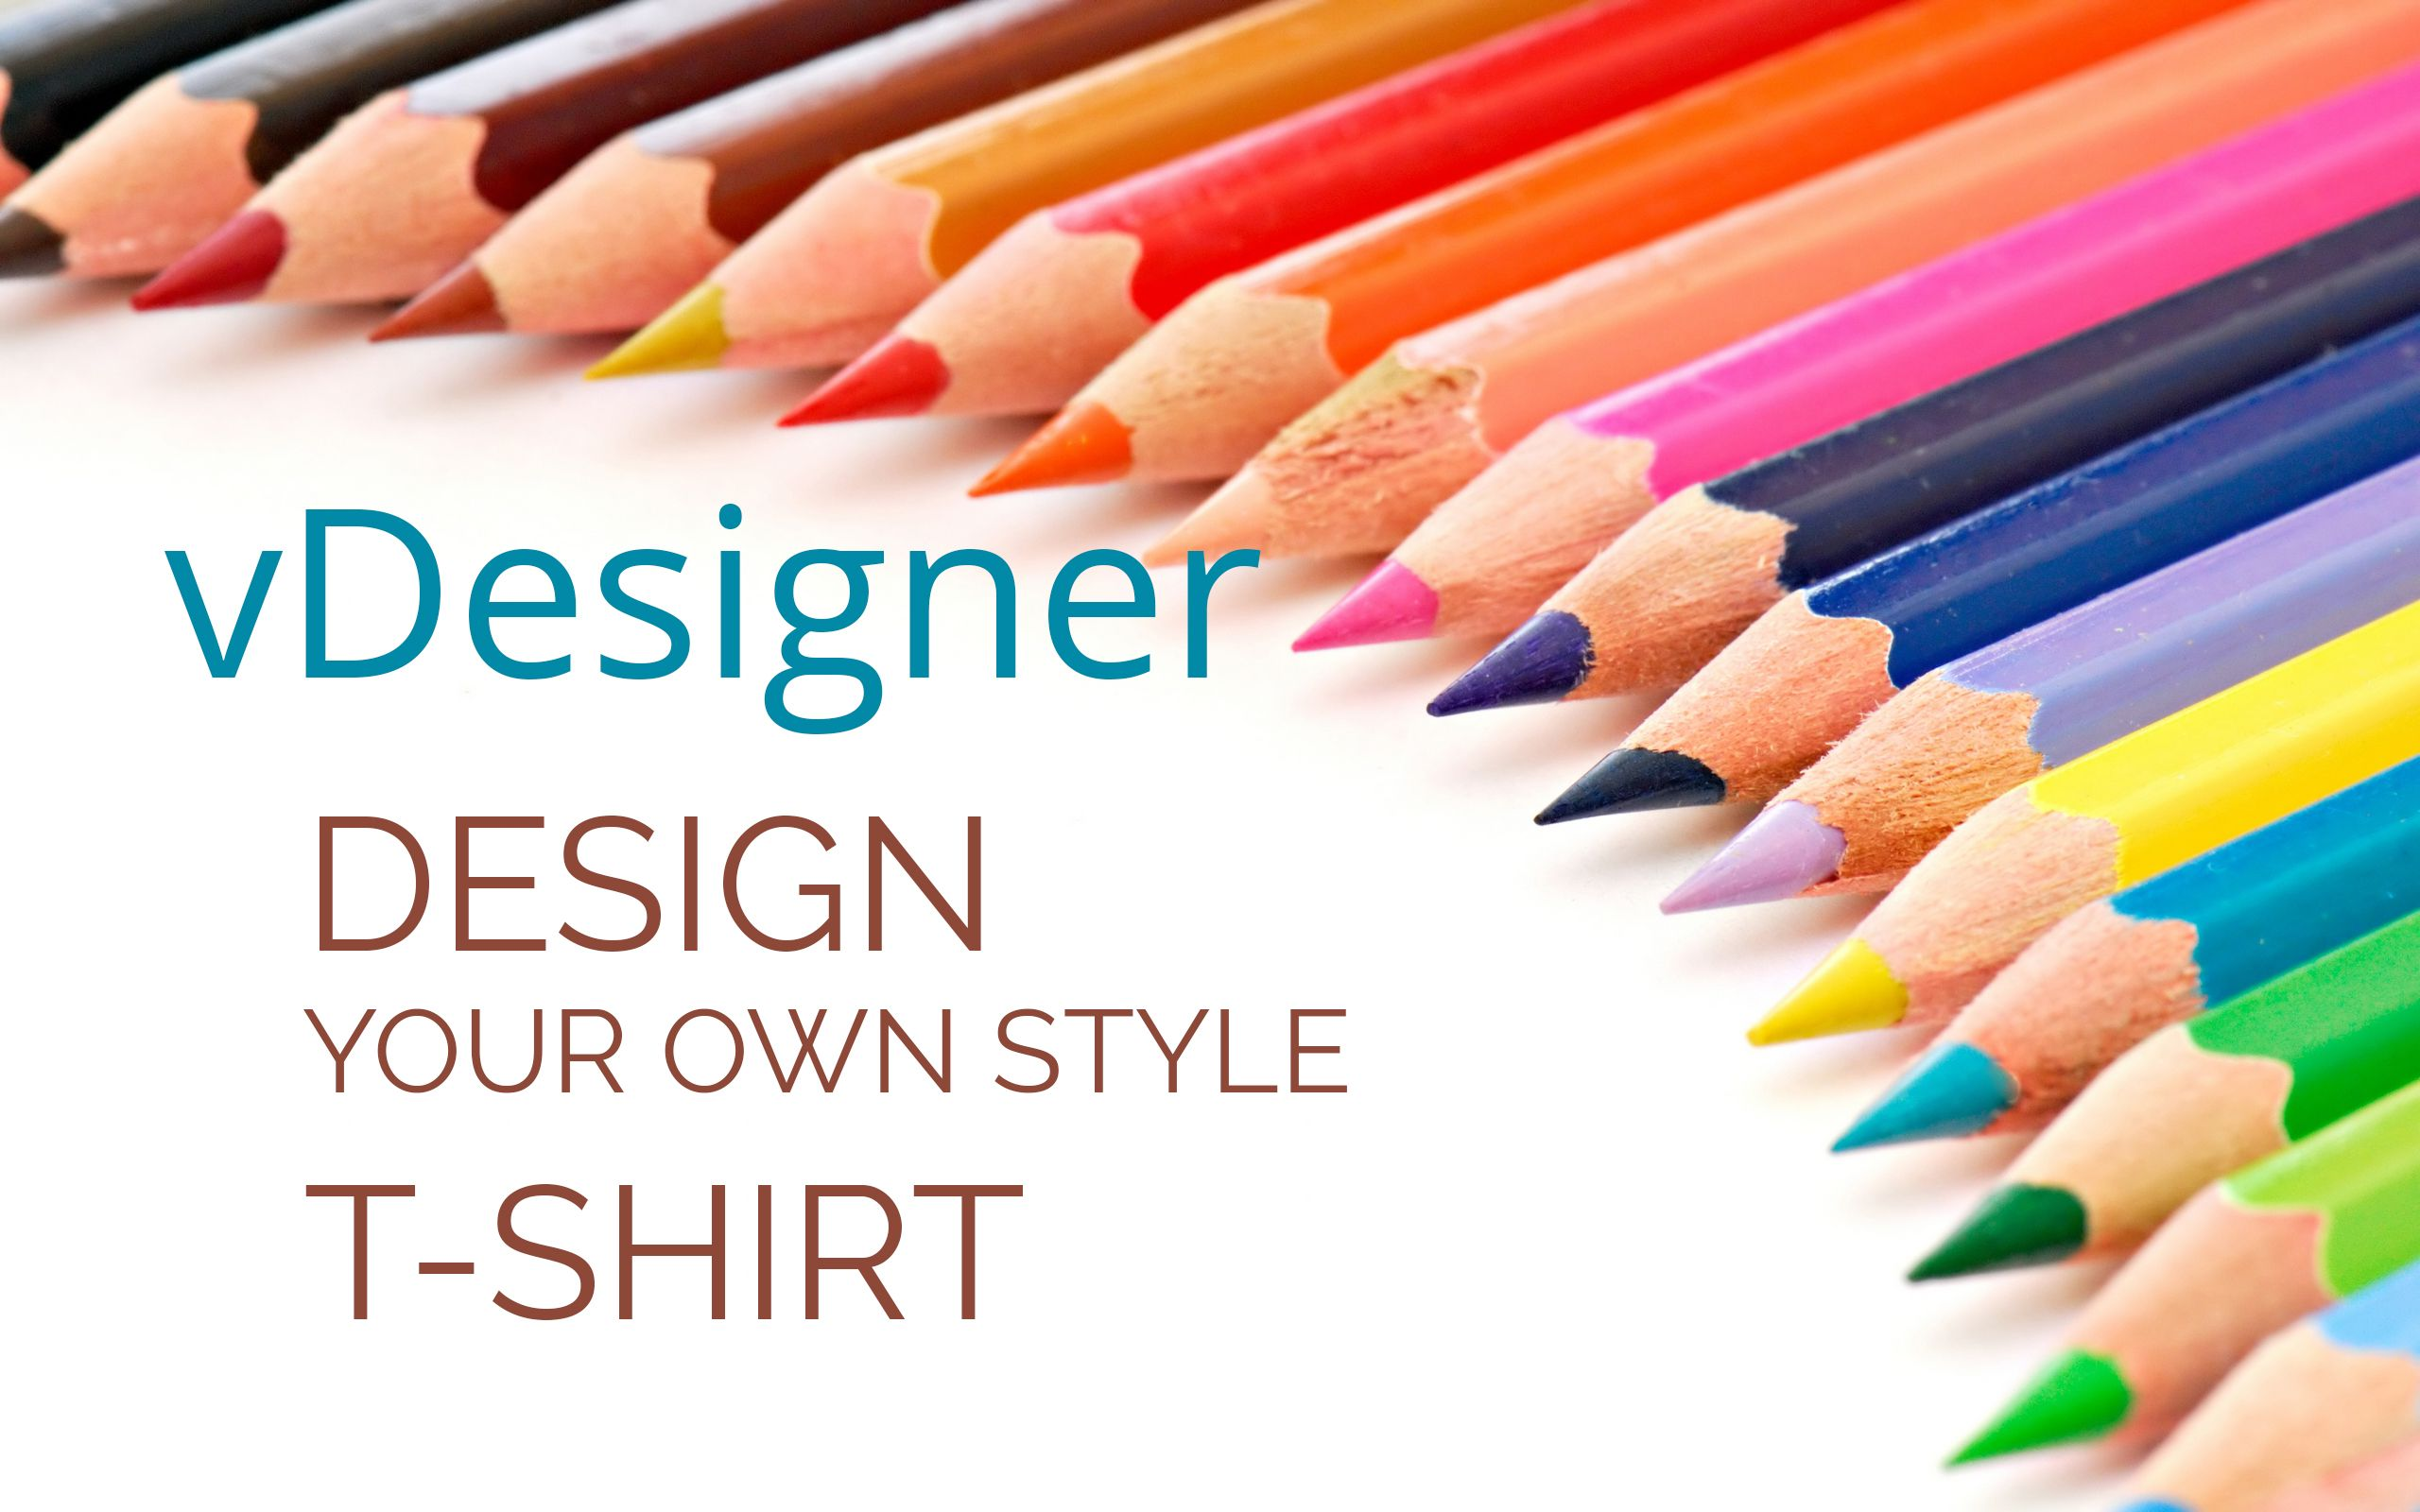 vDesigner for #Virtuemart  http://goo.gl/WCY8ti  #Joomla #Onlinedesigner #Tshirtdesigns #PosterDesign #CustomDesign #Trending